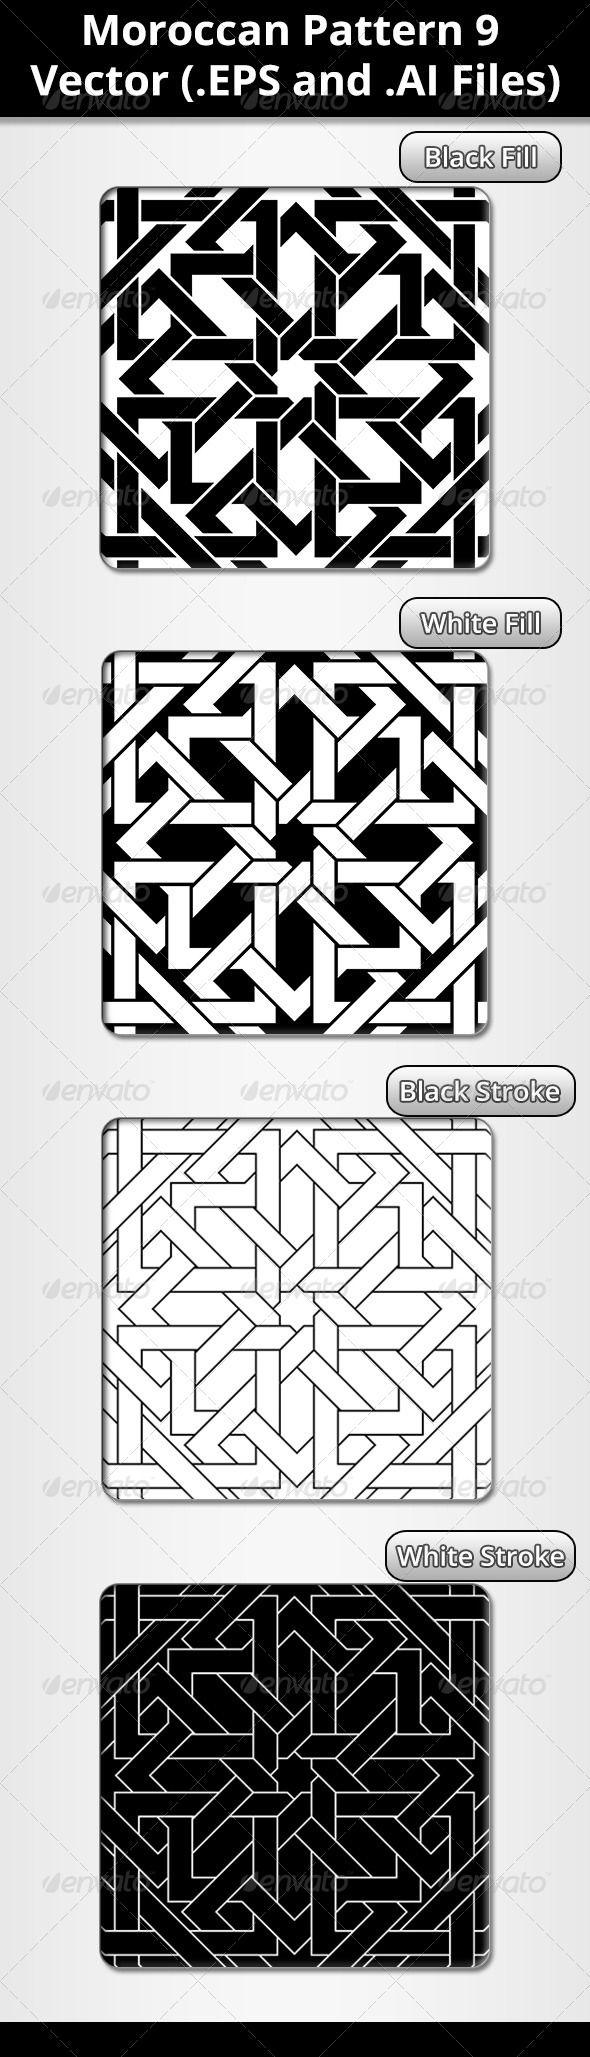 Moroccan Pattern | Moroccan pattern, Moroccan and Patterns